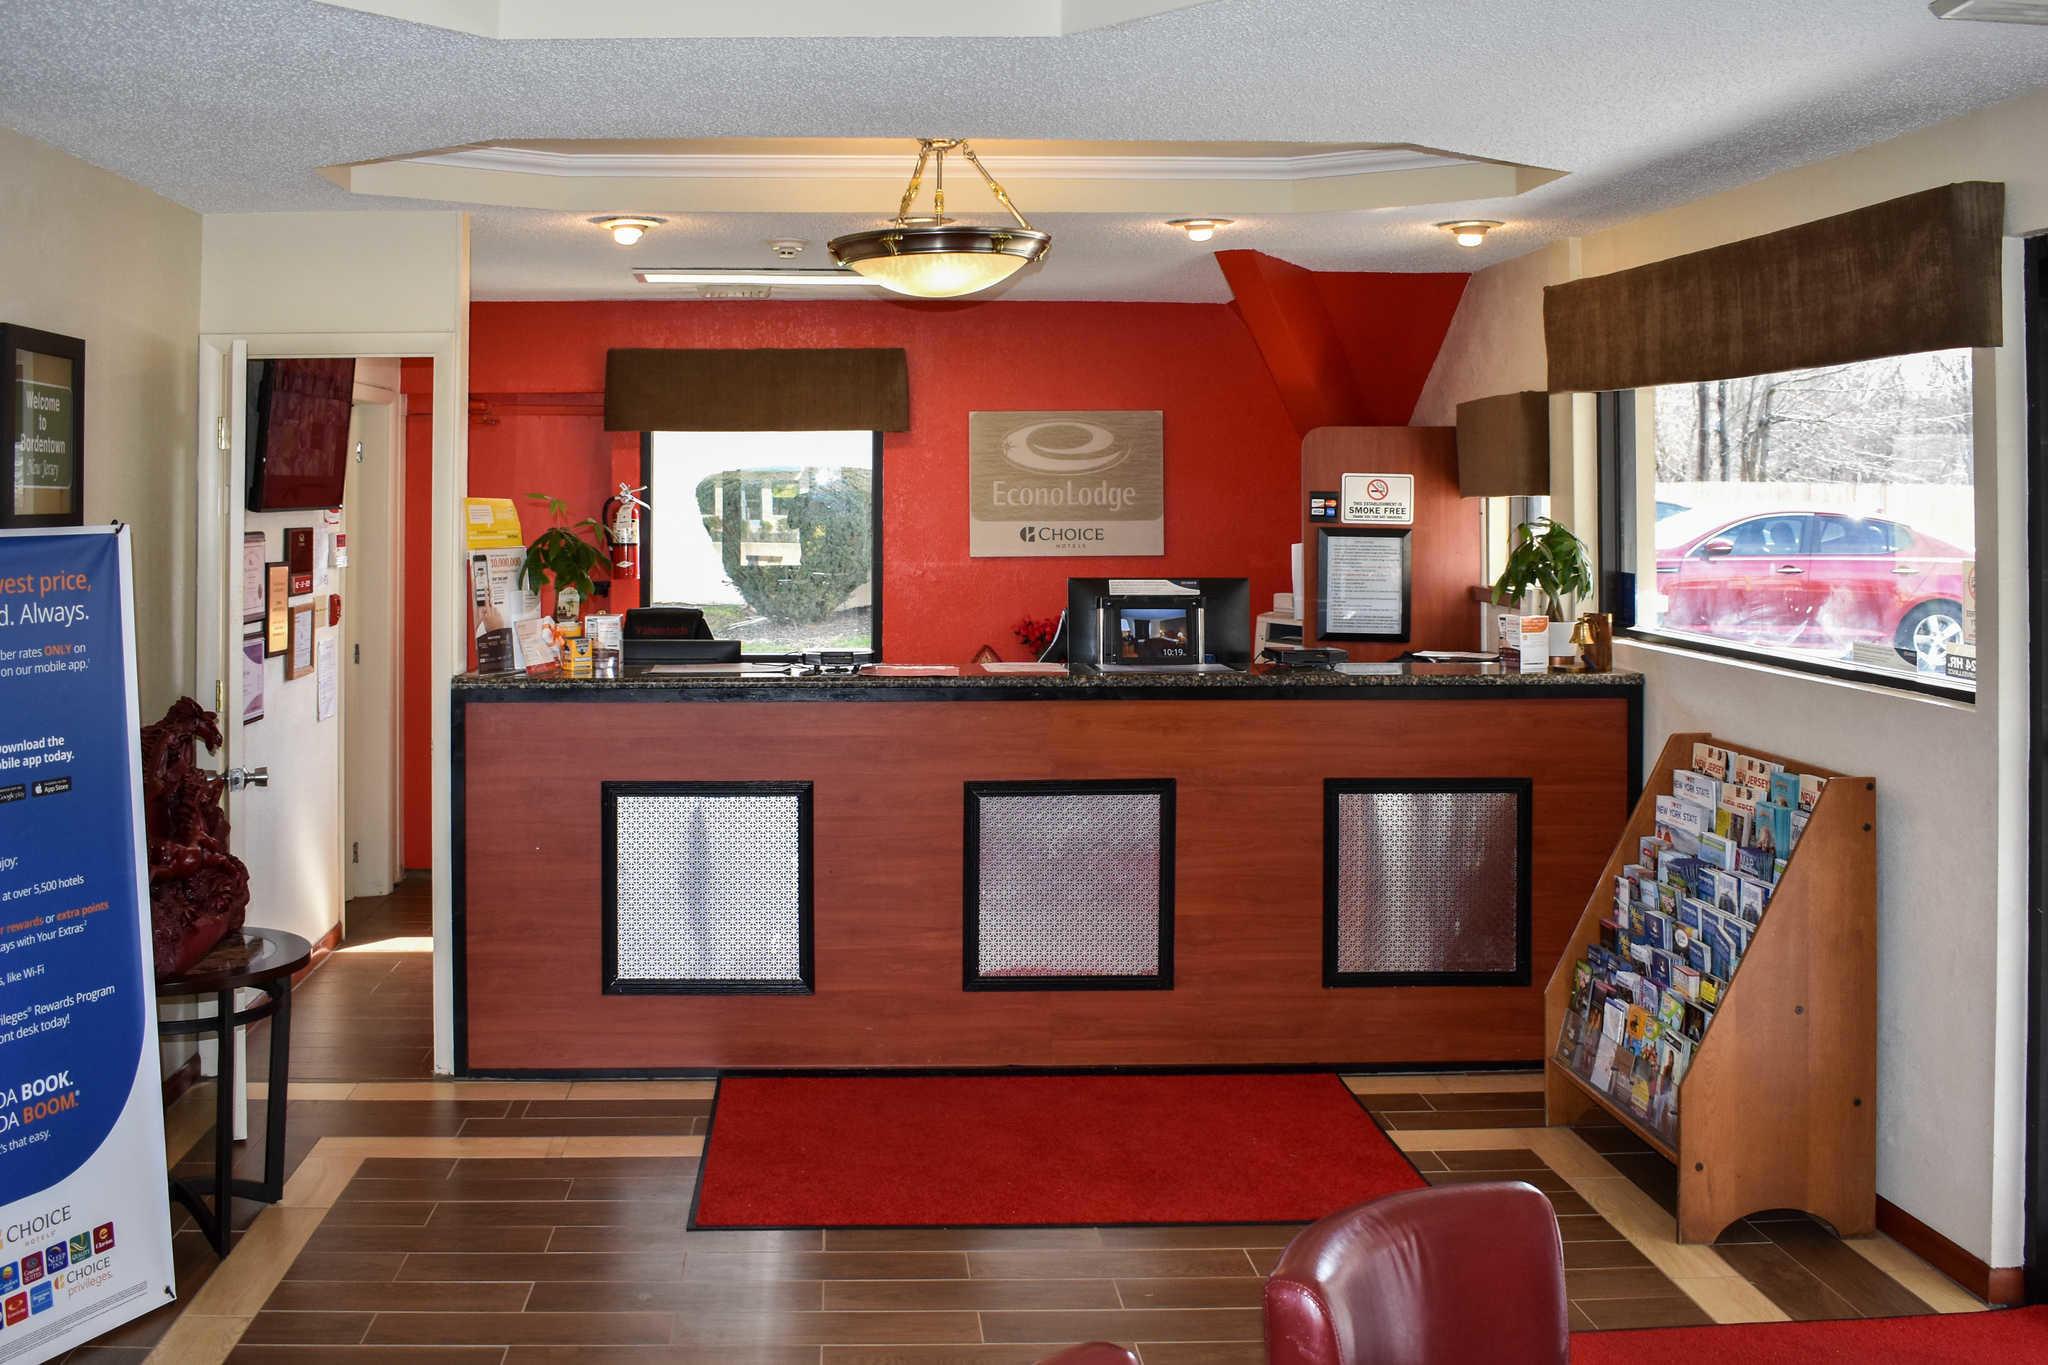 Econo Lodge Inn & Suites - Closed image 9